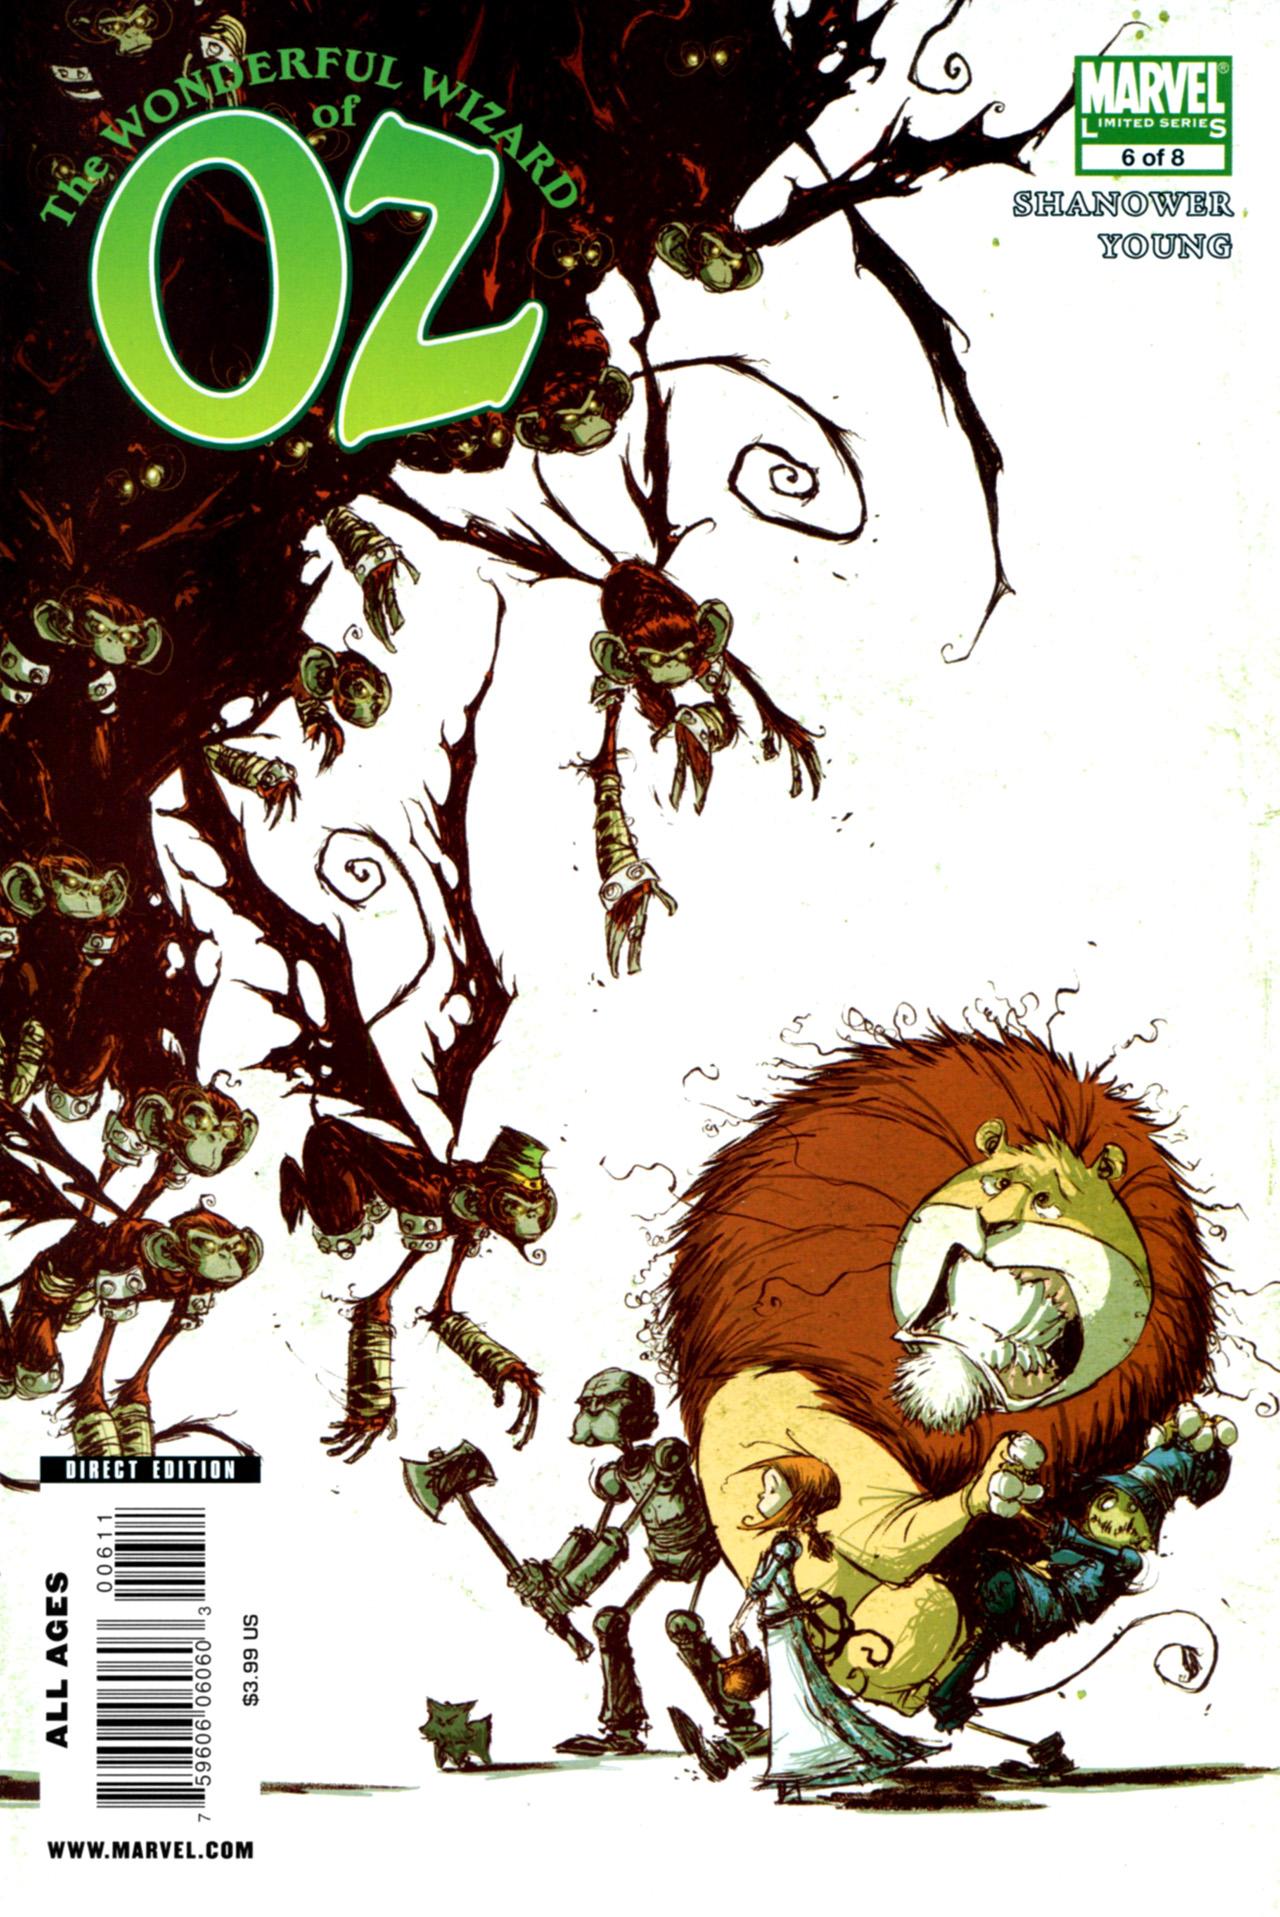 The Wonderful Wizard of Oz Vol 1 6